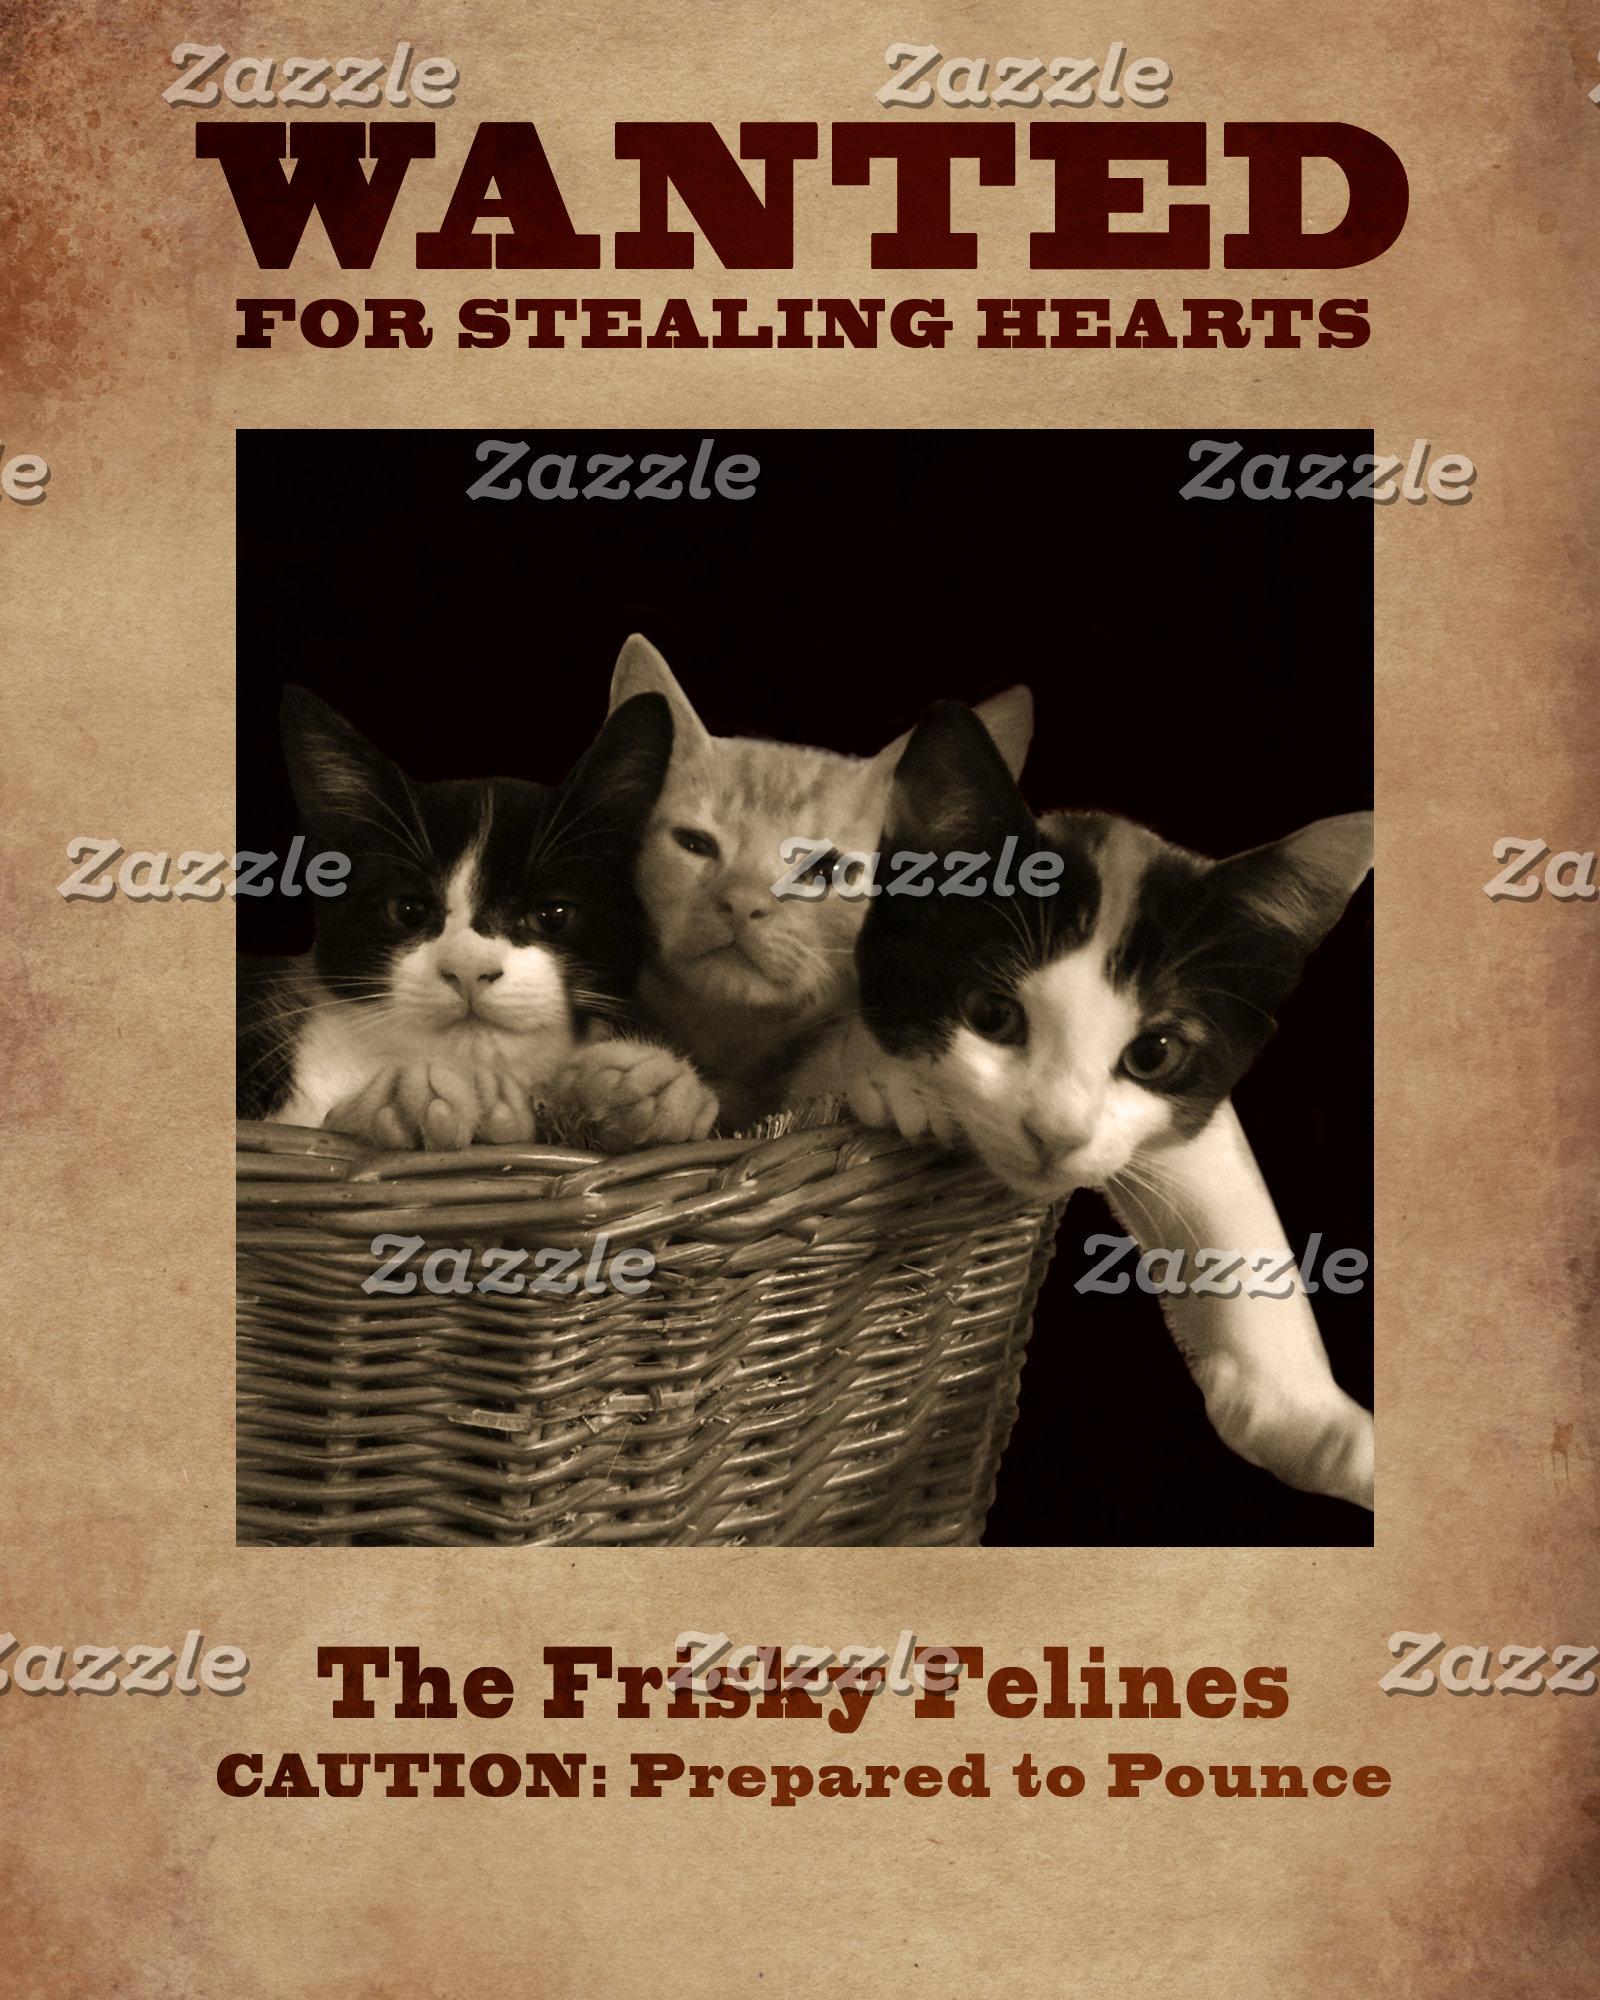 The Frisky Felines